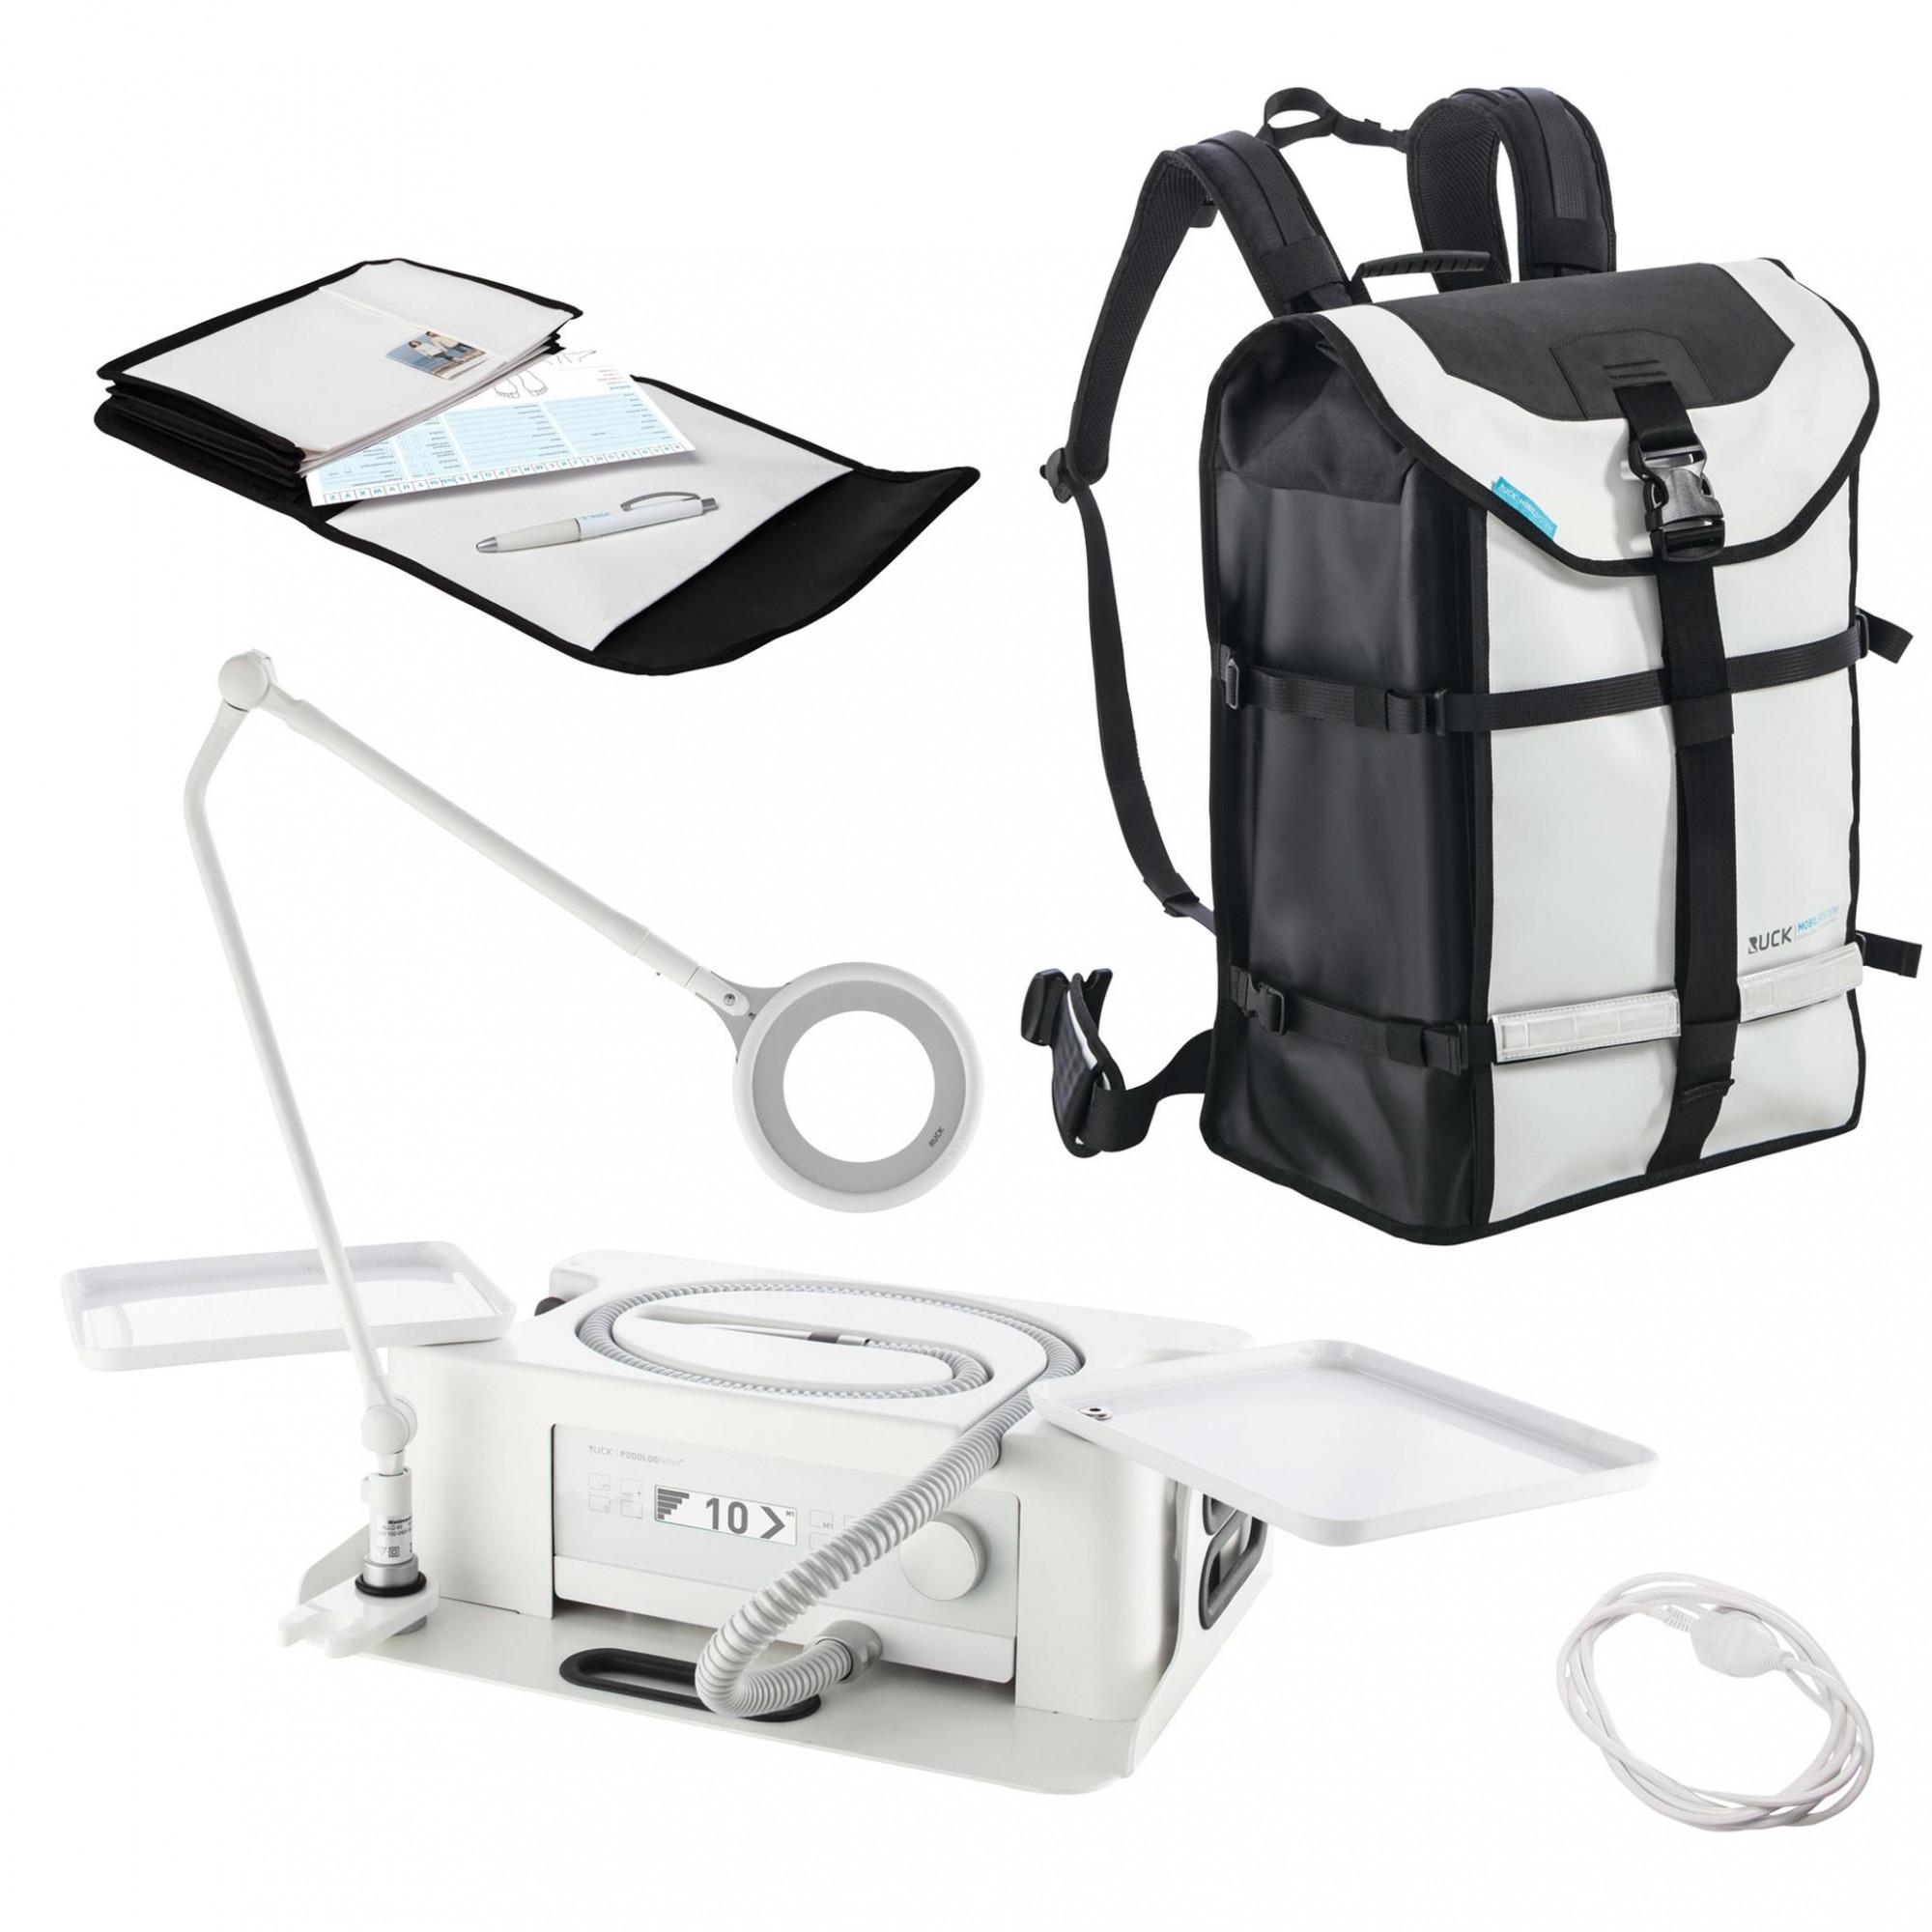 Pack - Rucksack + Micromoteur Nova / Eco / One + Lampe Circle S - Ruck